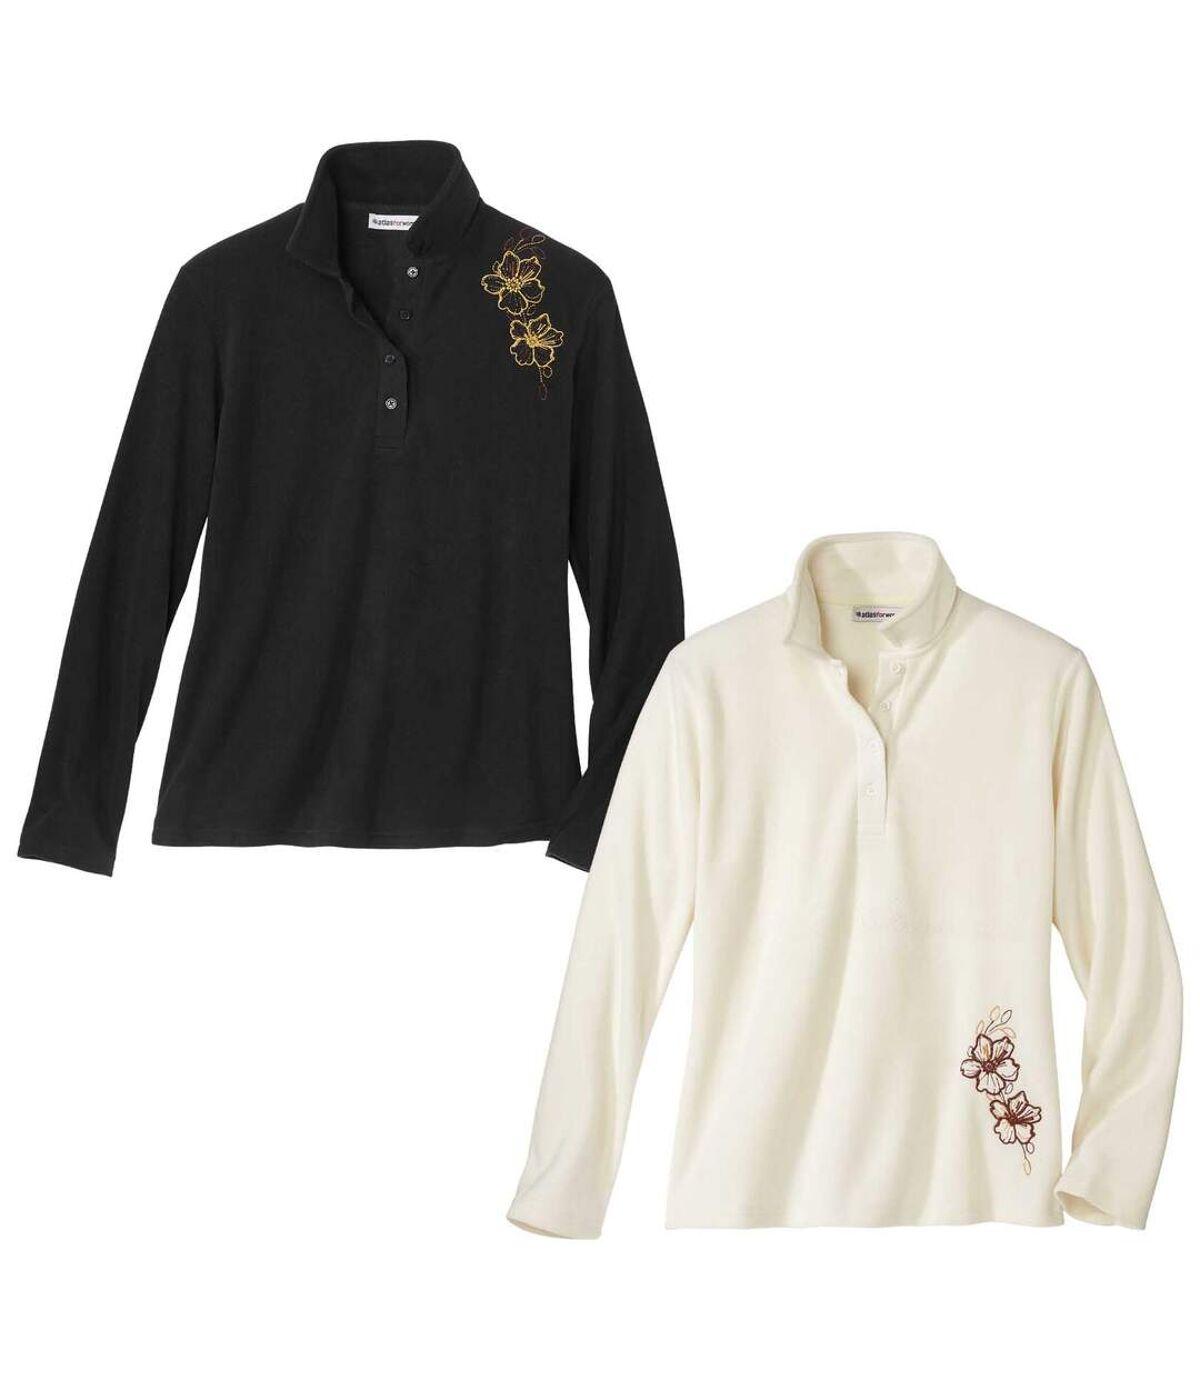 Pack of 2 Women's Microfleece Sweaters - Black Off-White Atlas For Men